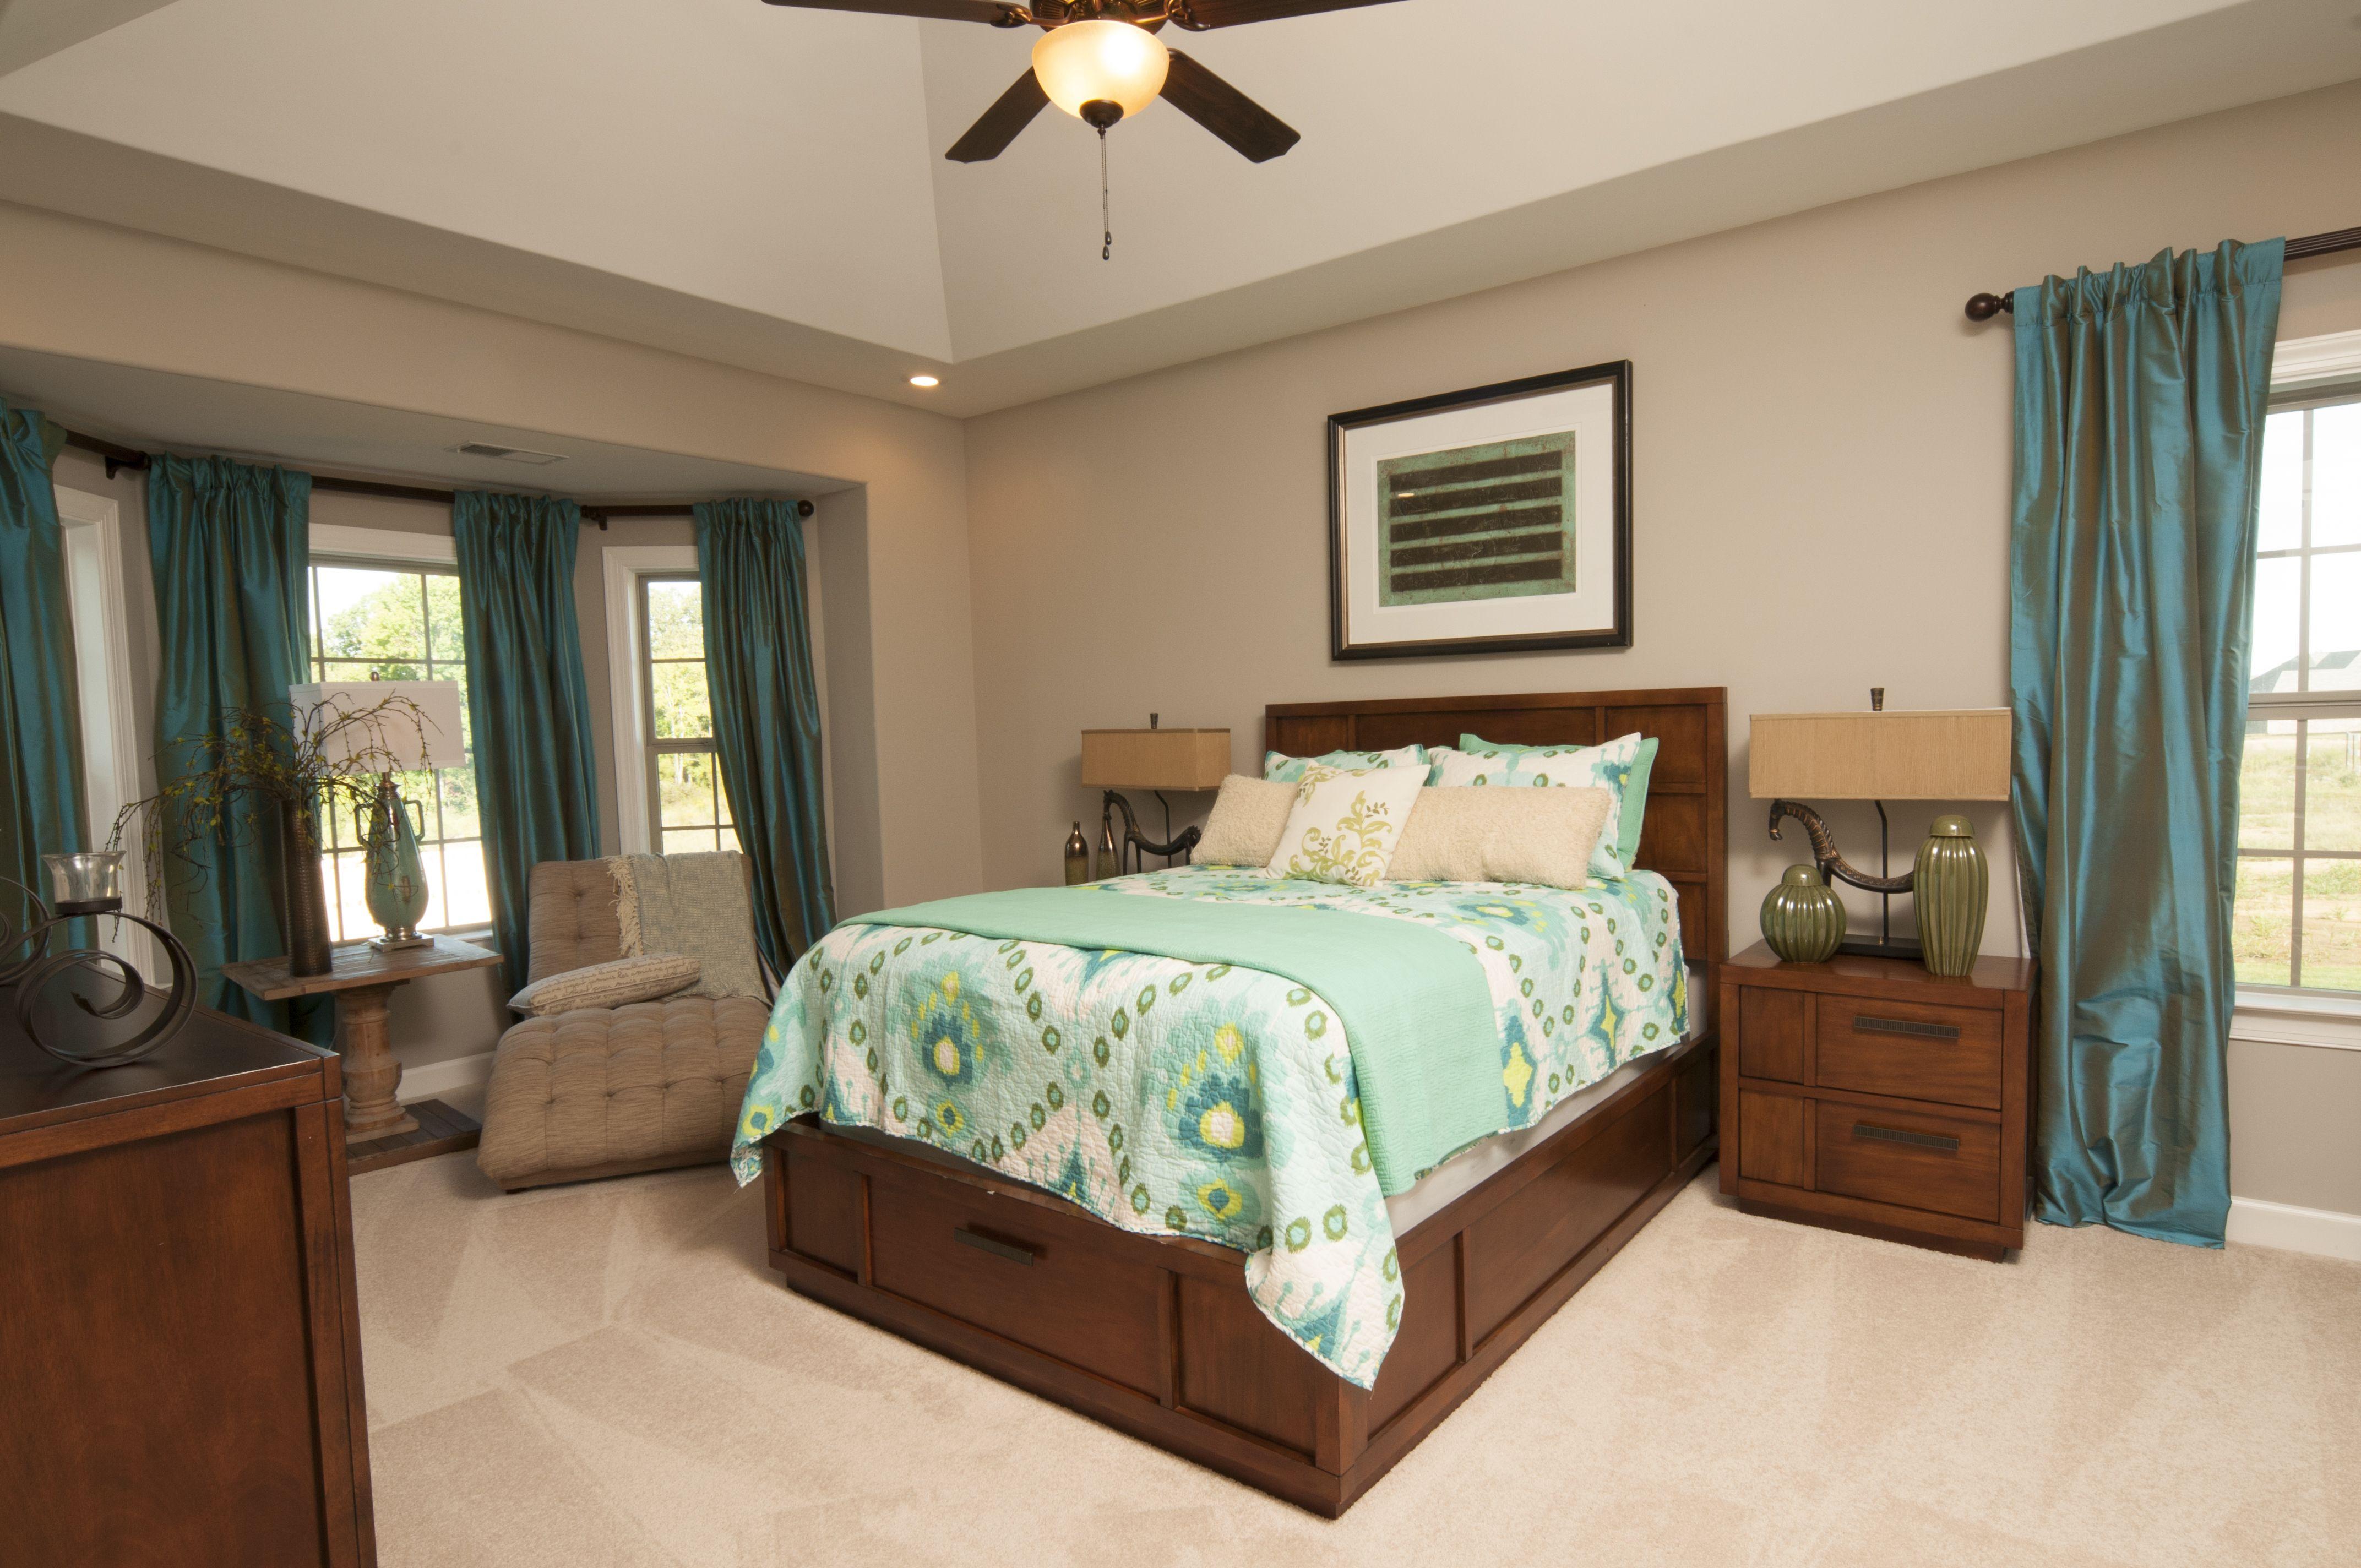 Regency Homebuilders Large Master Bedroom, Neutral, Pops